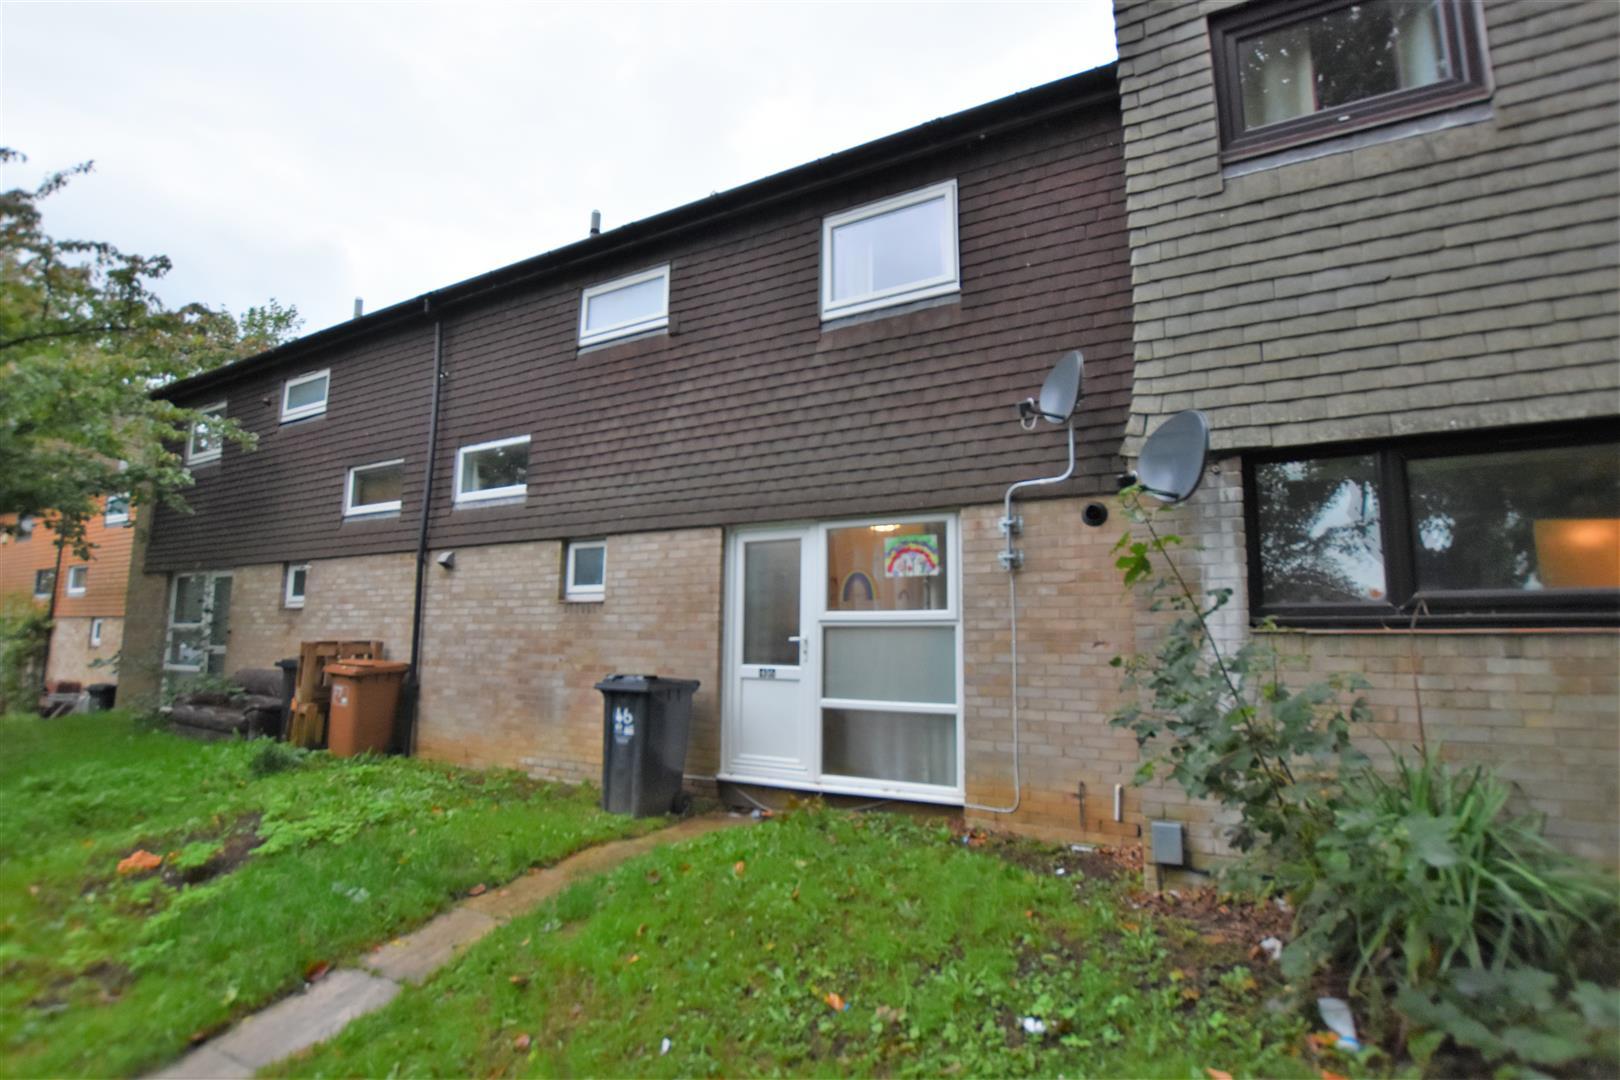 Three bedroom house for sale, Northampton